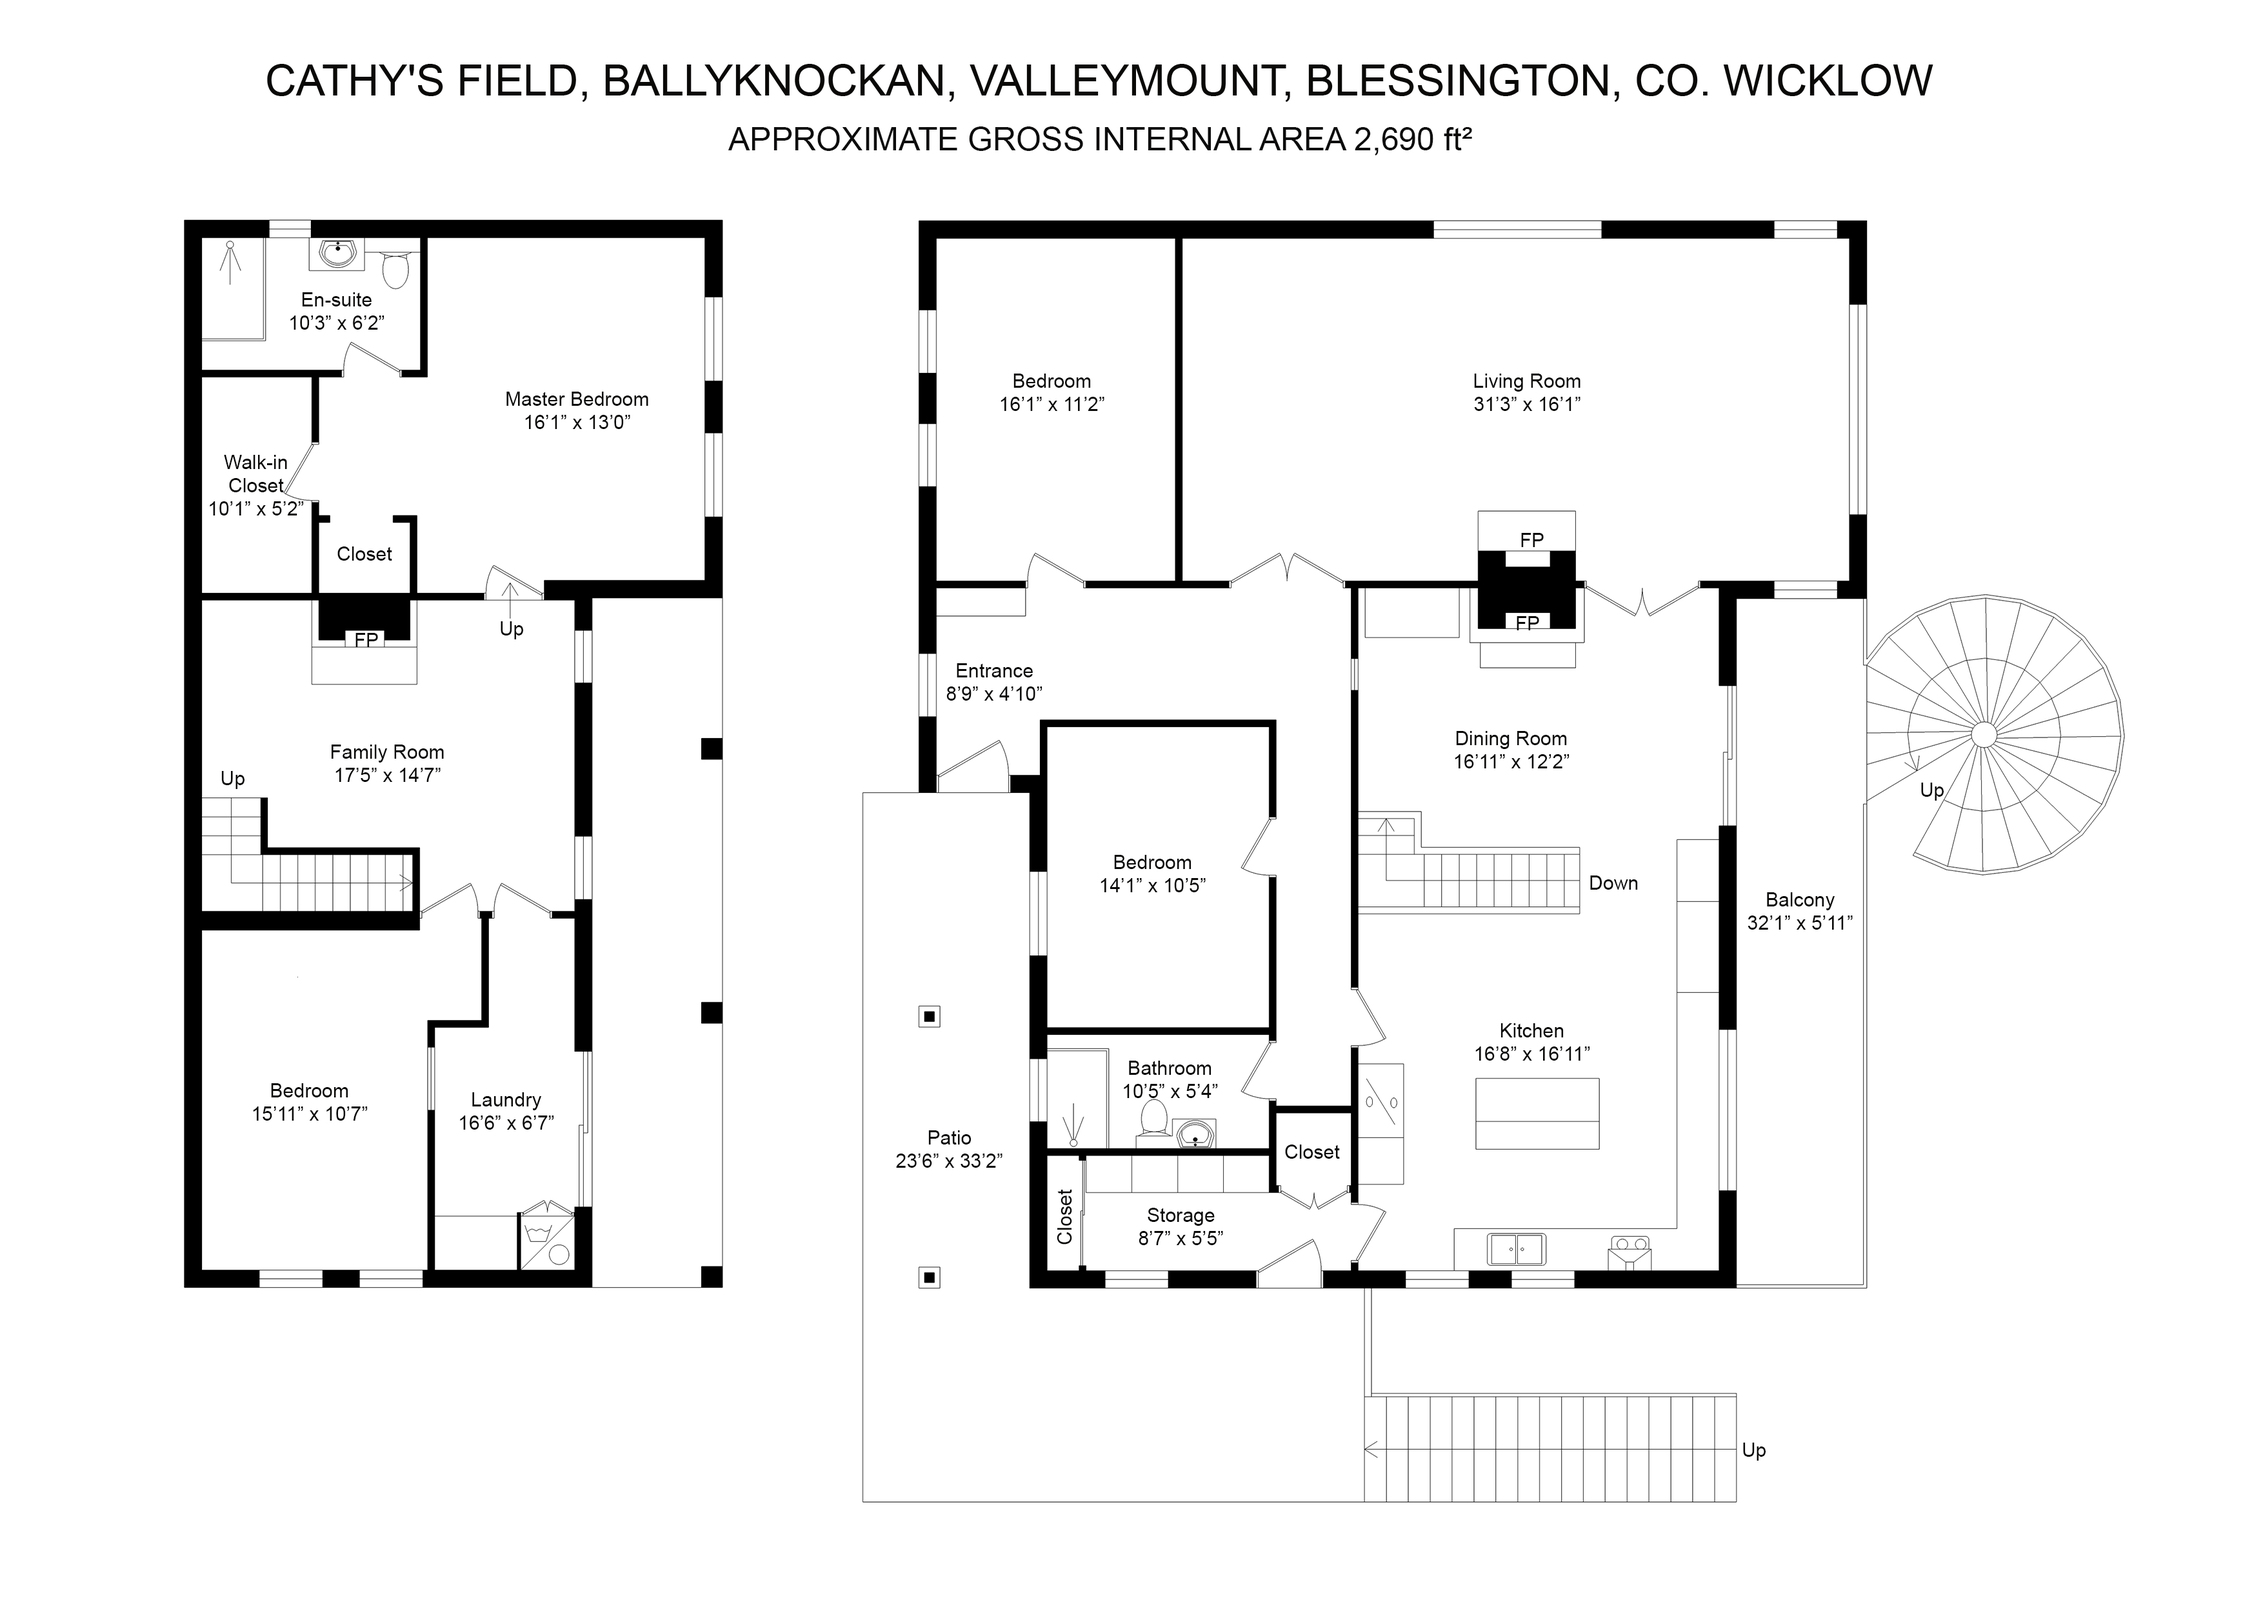 Cathy's Field, Ballyknockan, Blessington, Co. Wicklow